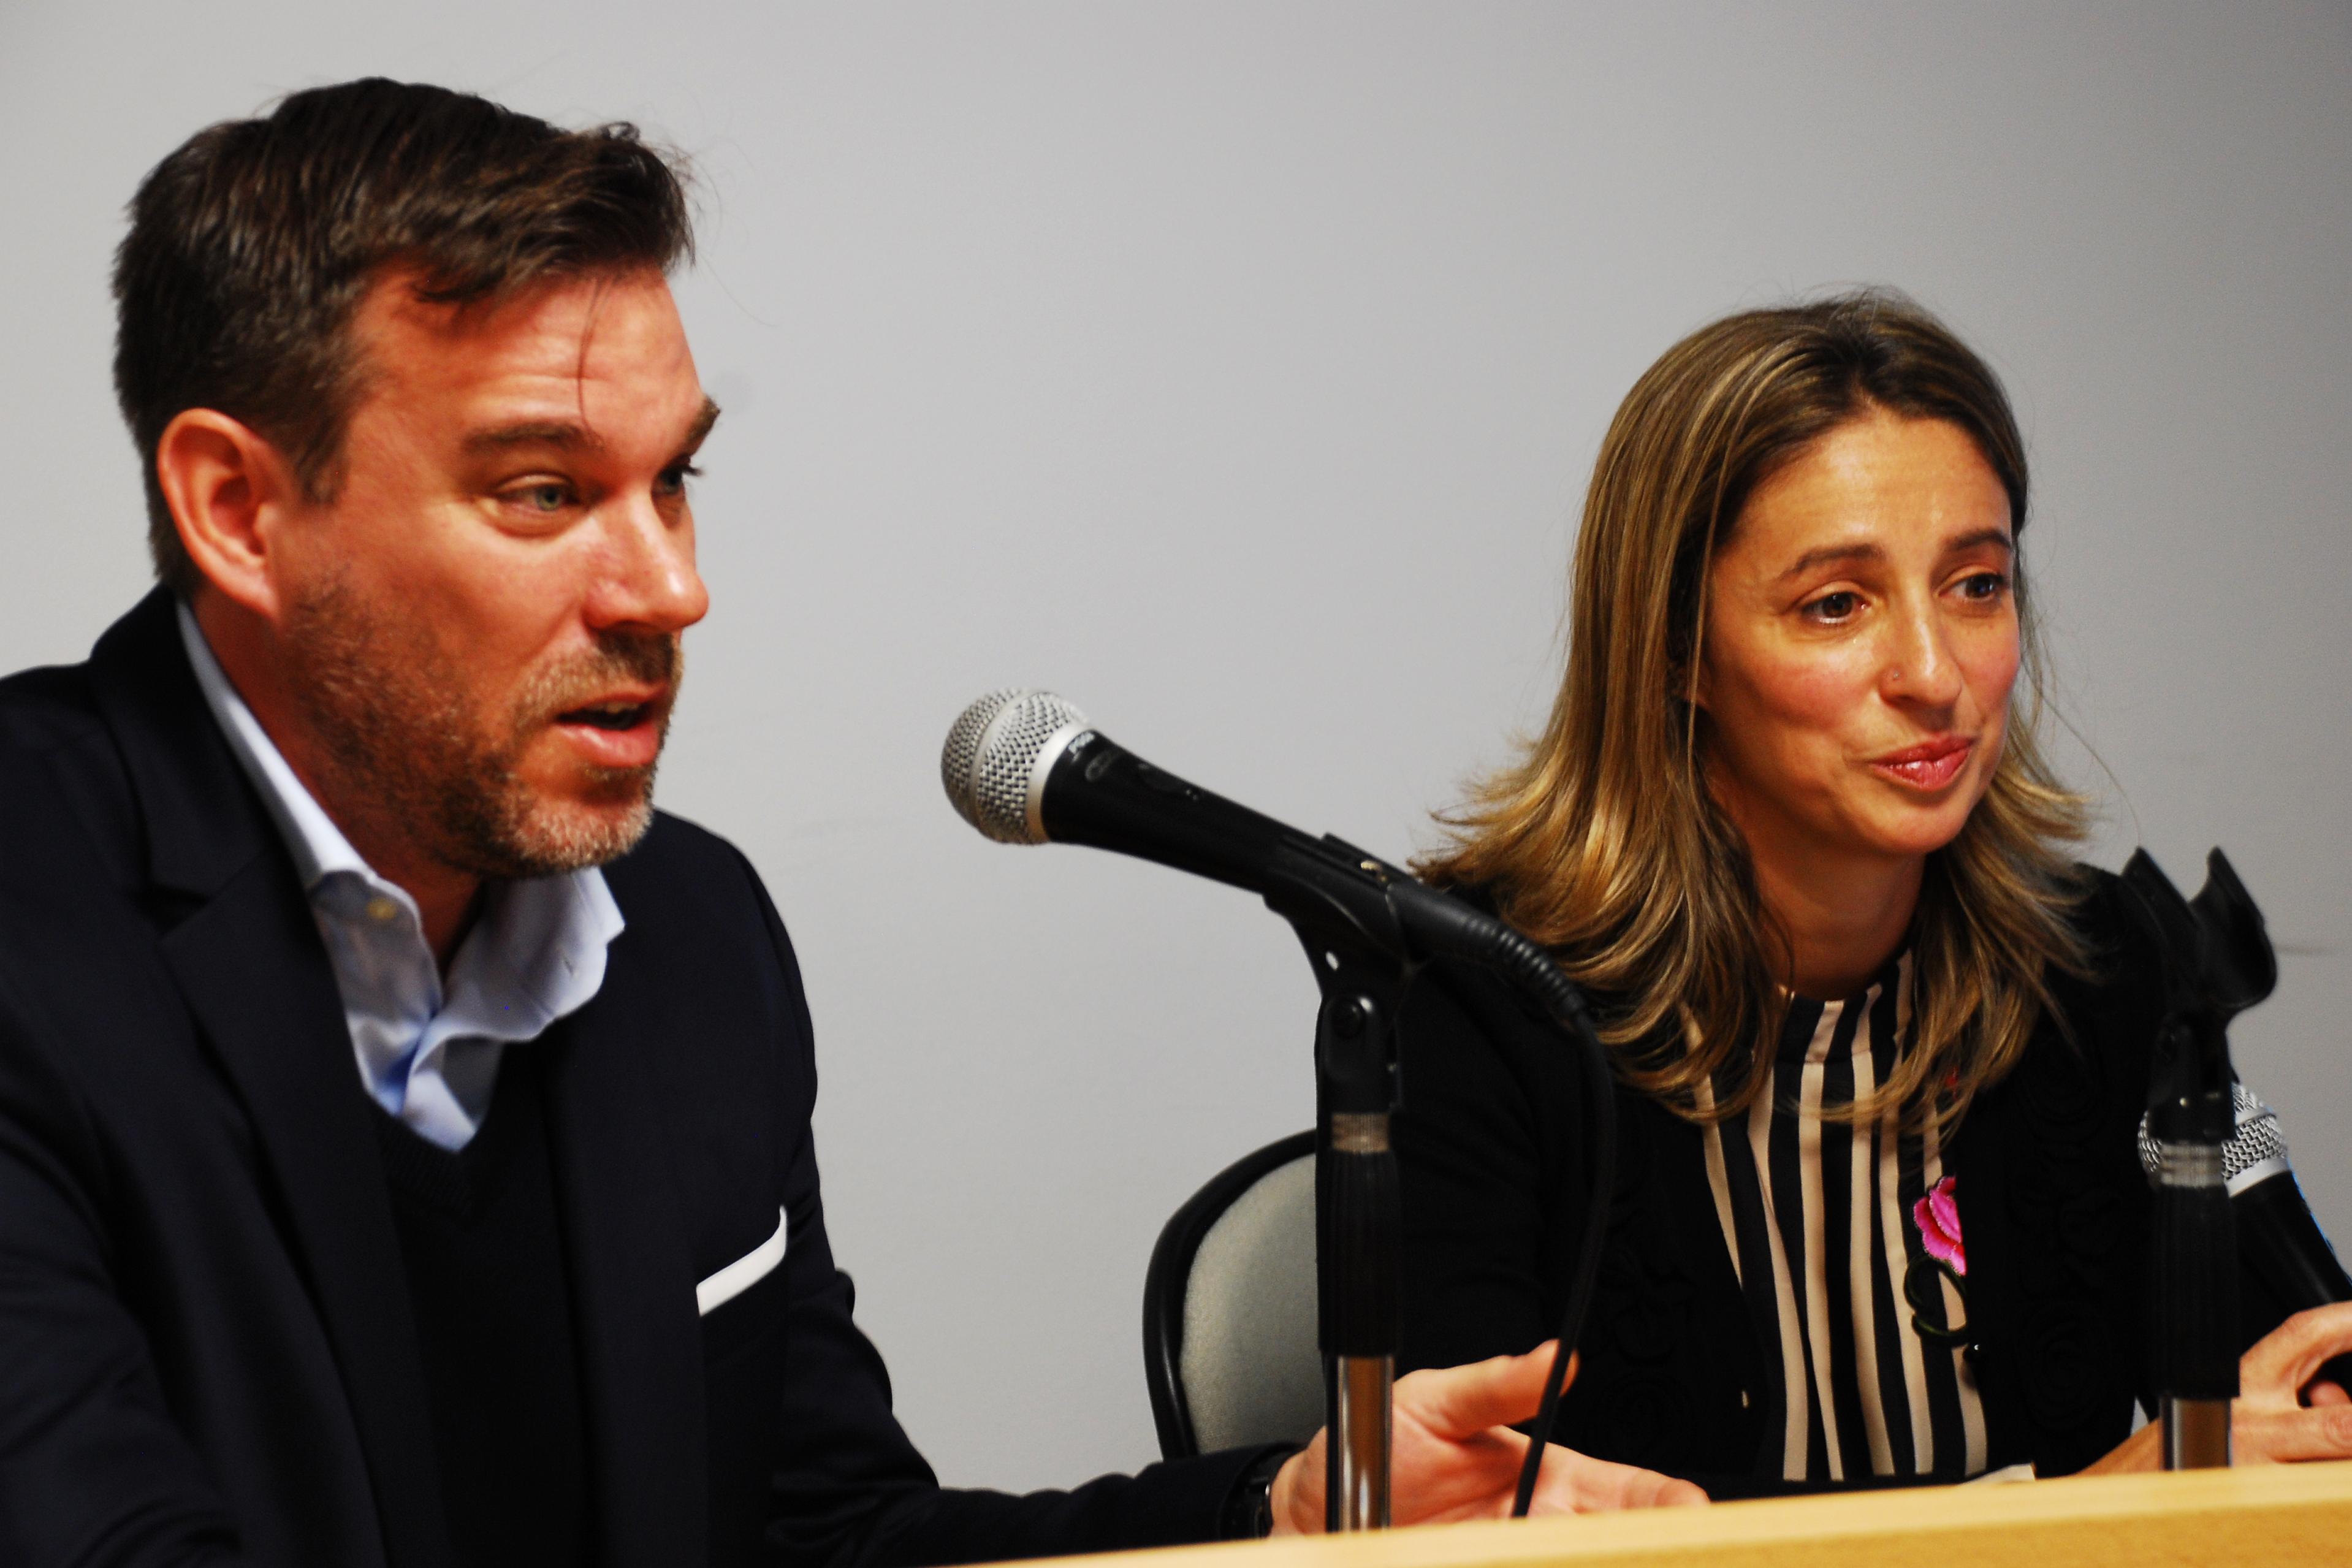 Ignacio C. Alberto y Marina Kienast